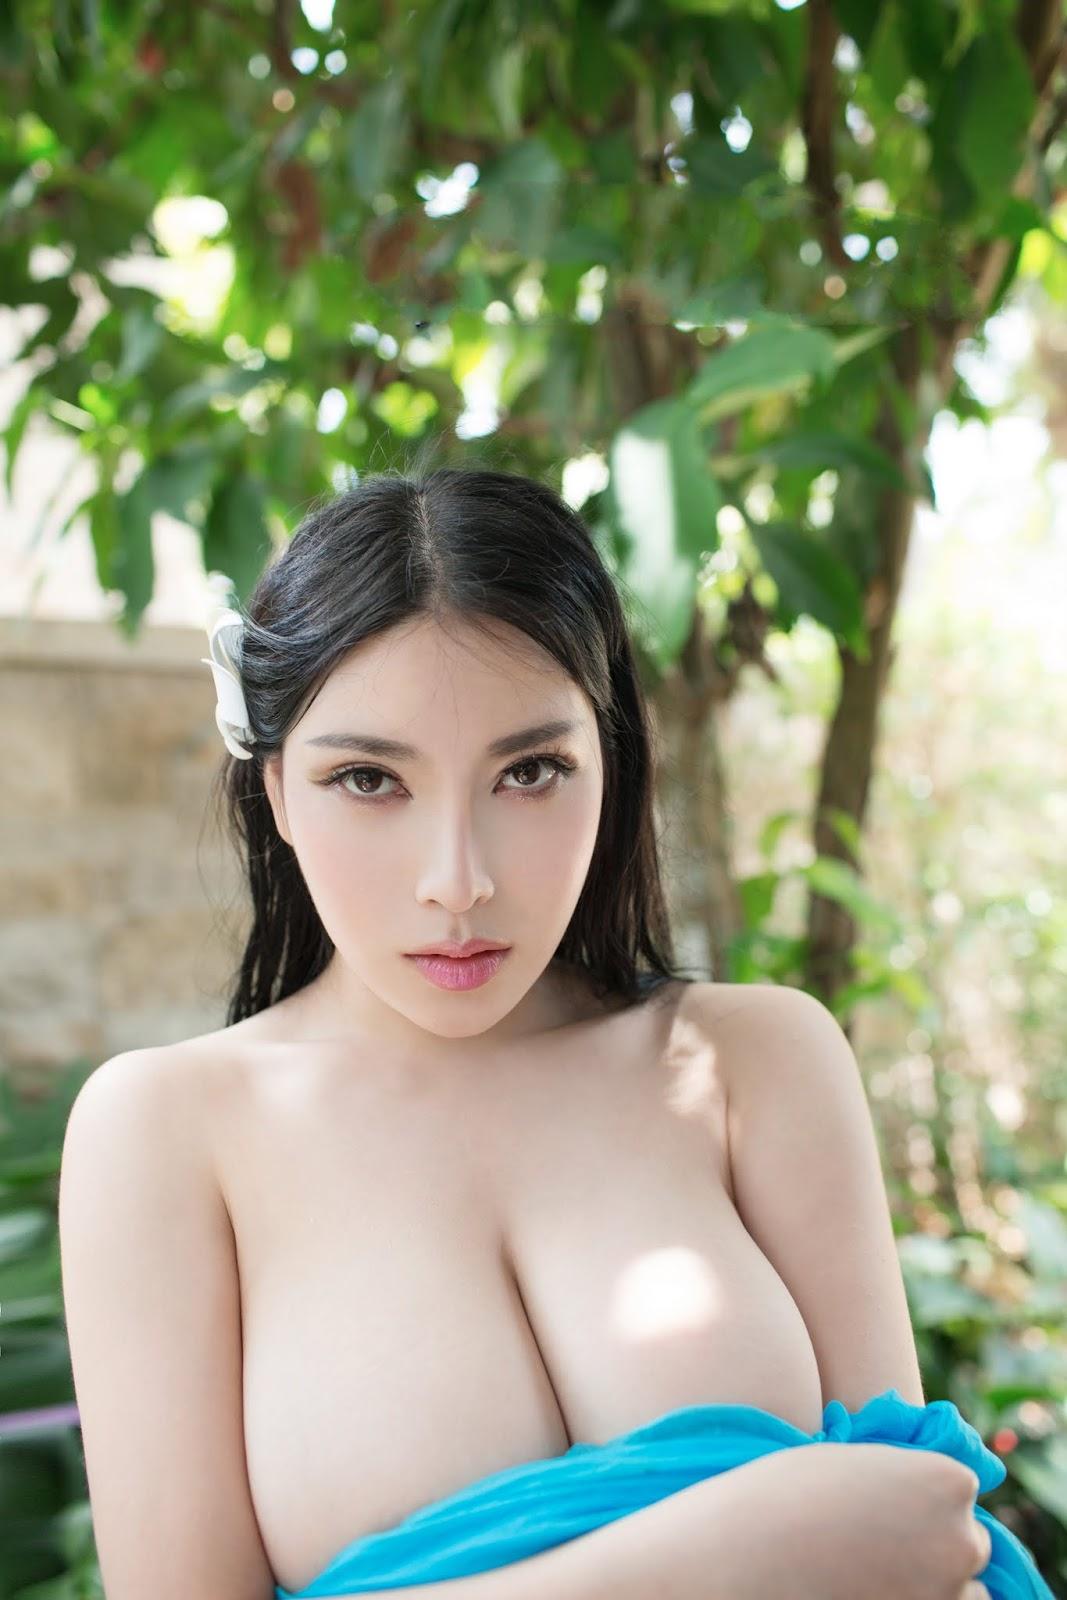 12 - Hot Model TuiGirl No.34